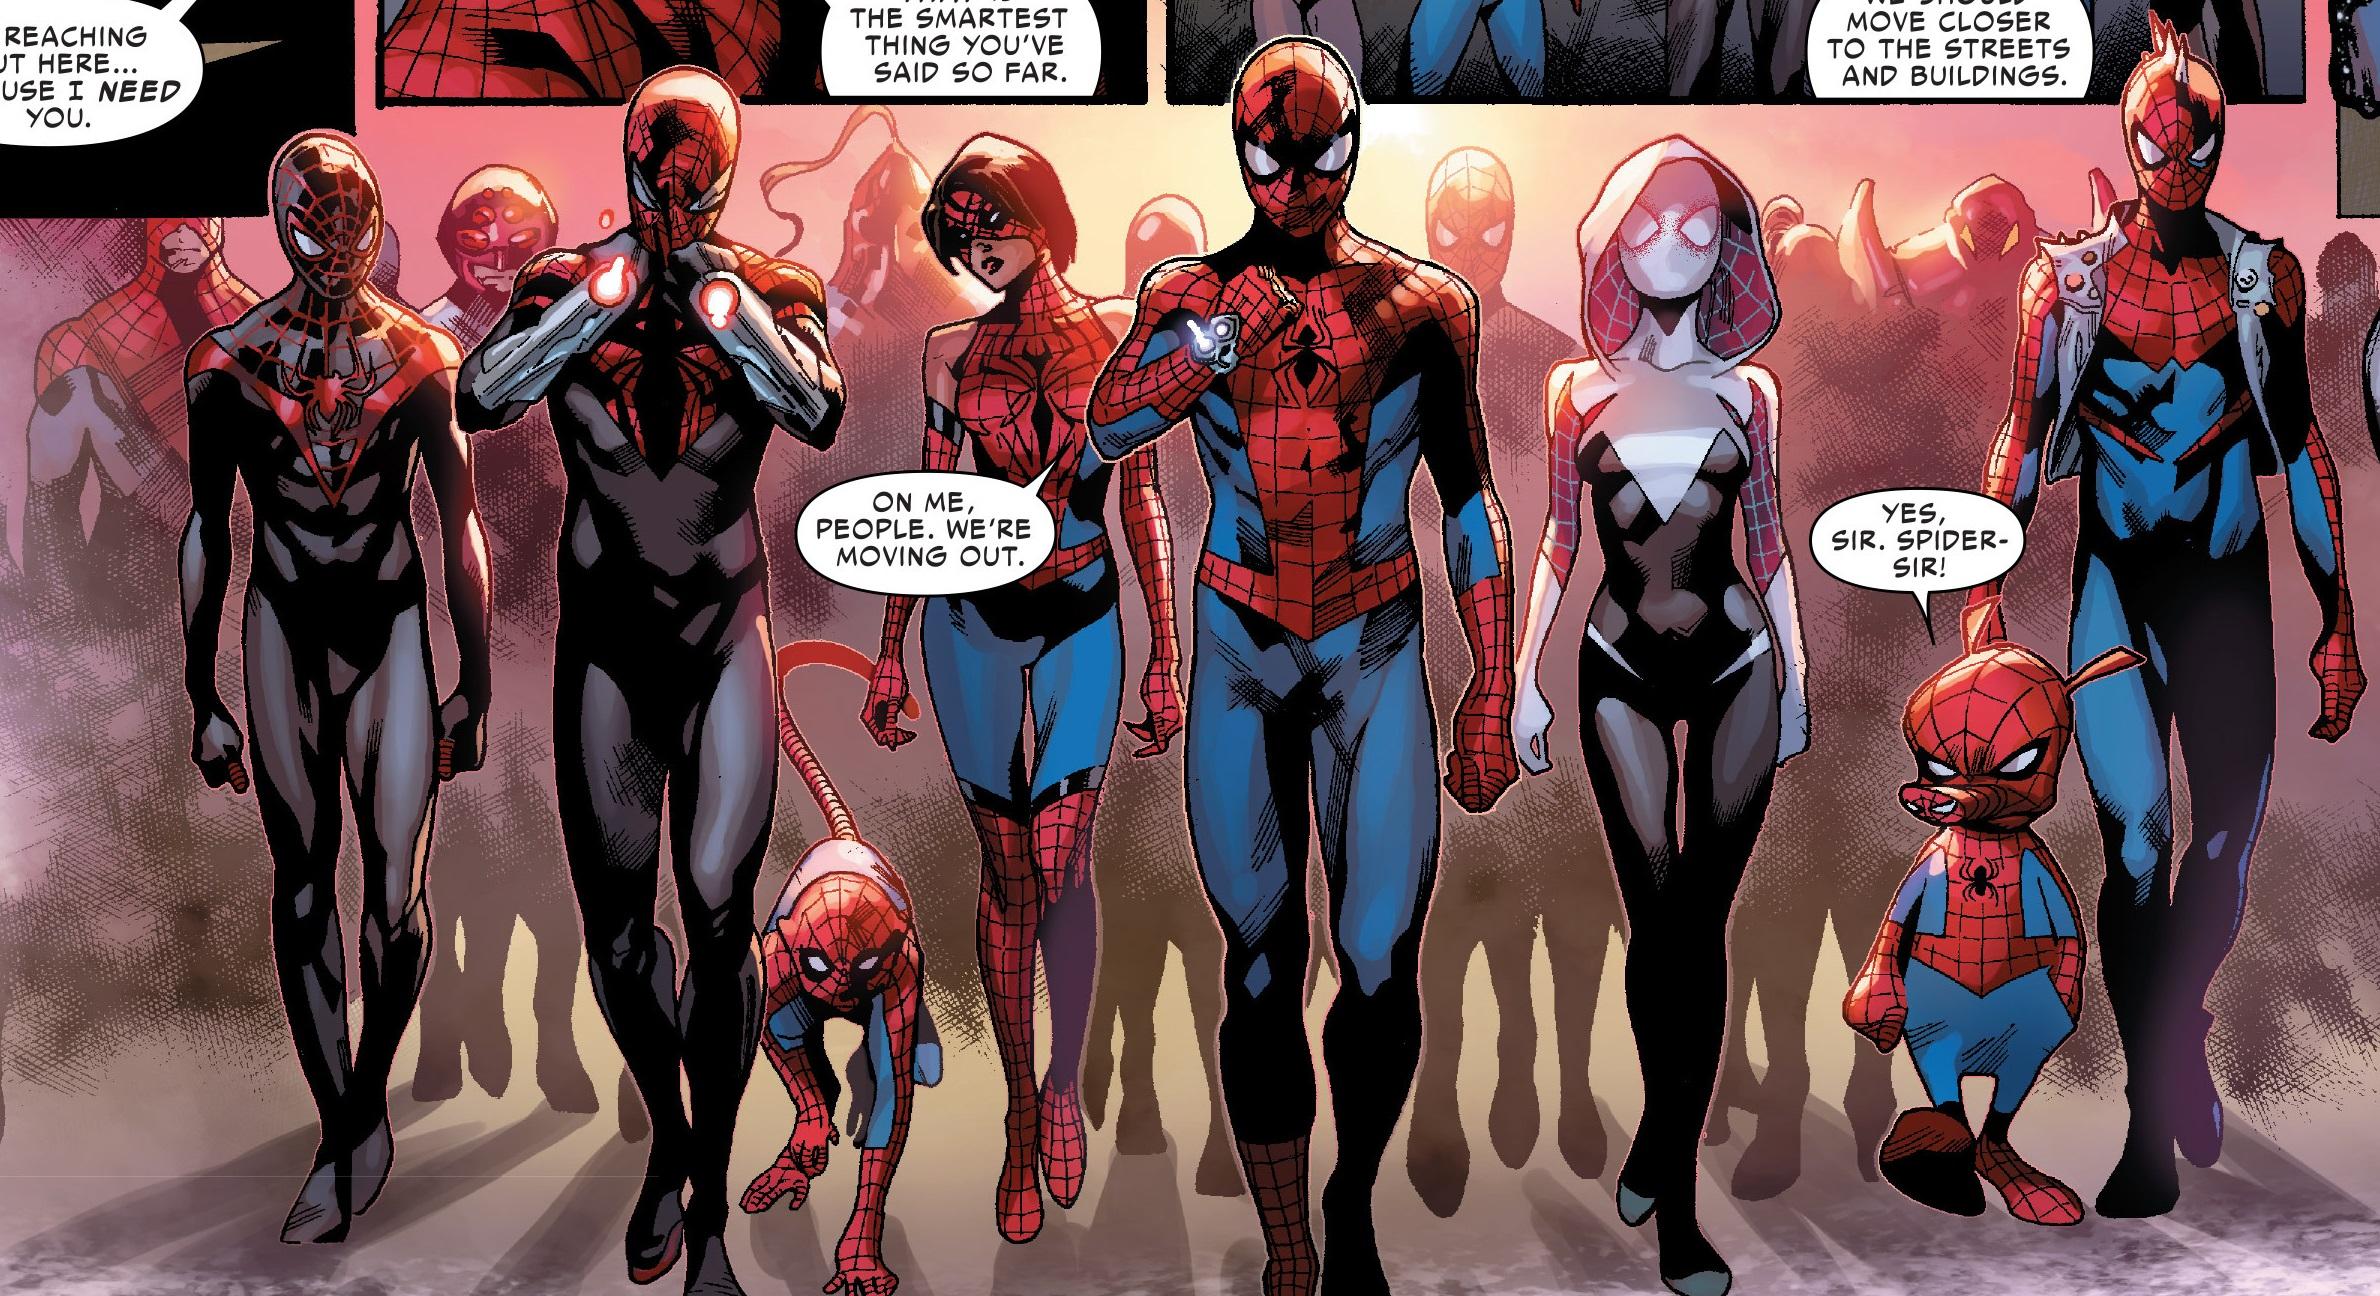 Spider-Army (Multiverse) from Amazing Spider-Man Vol 3 11 003.jpg